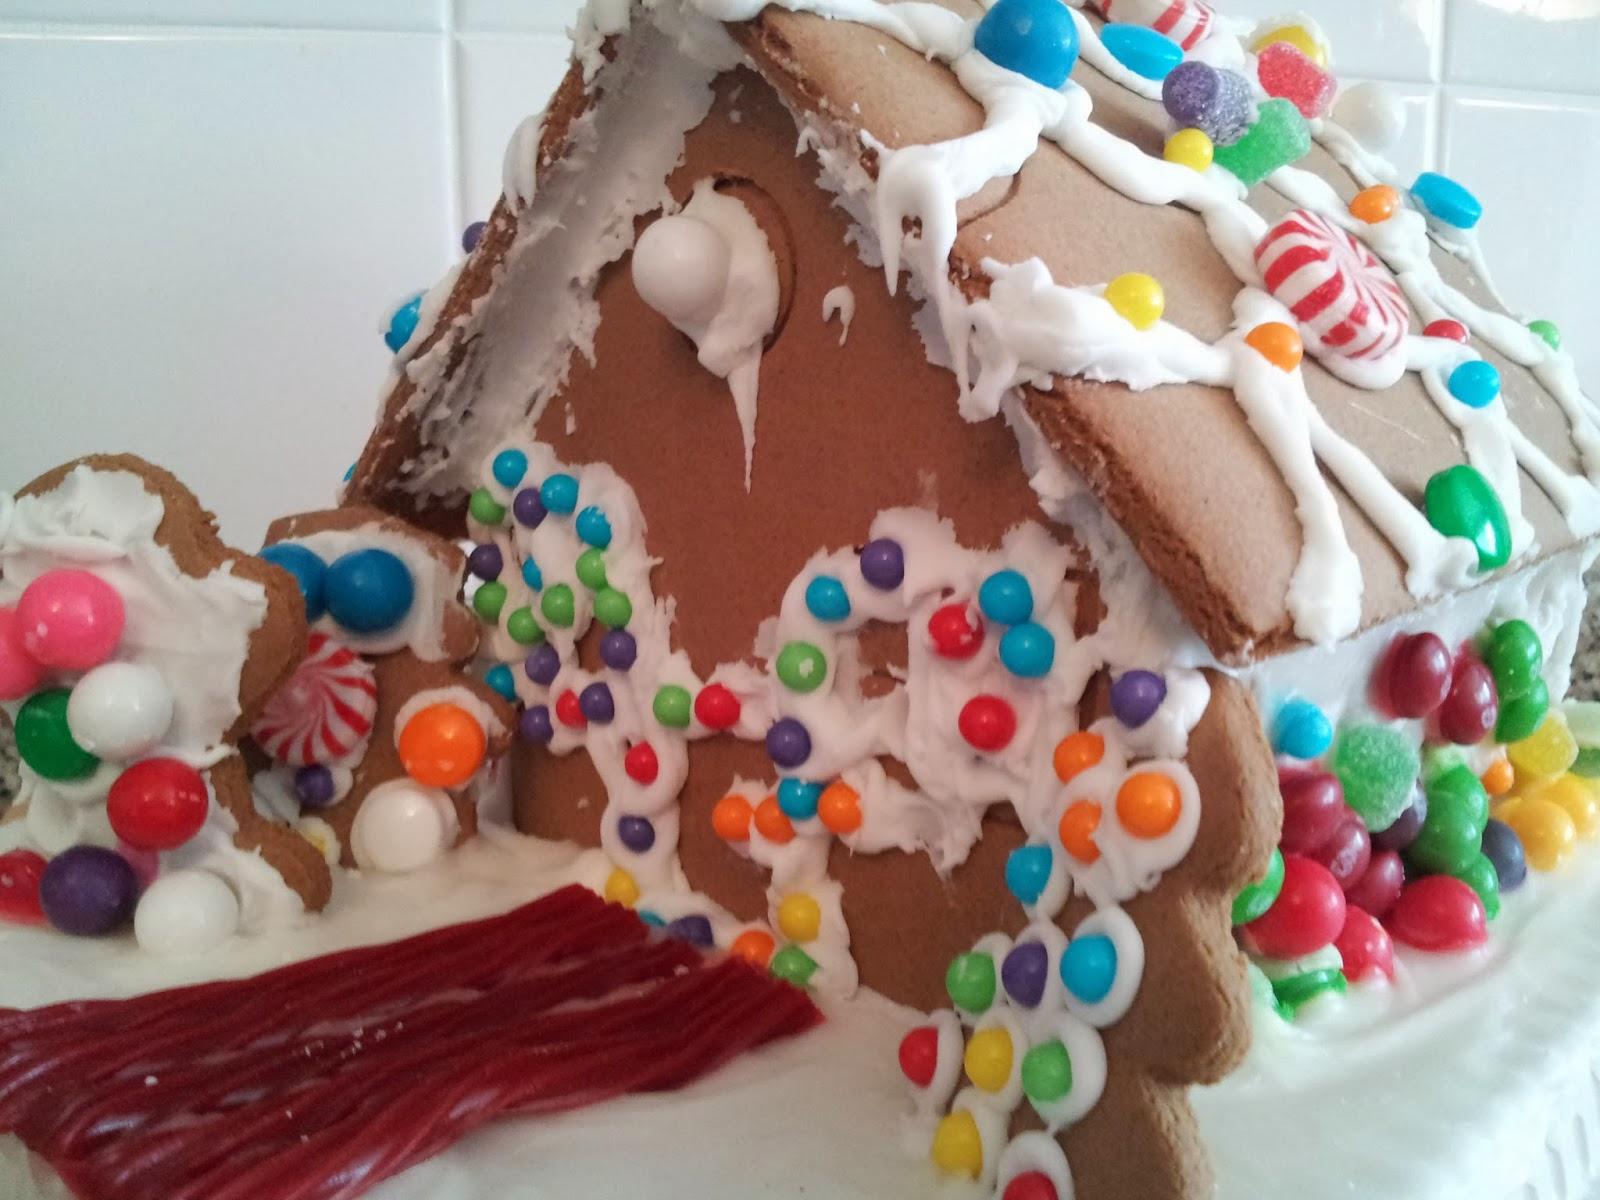 Christmas, baking, kids